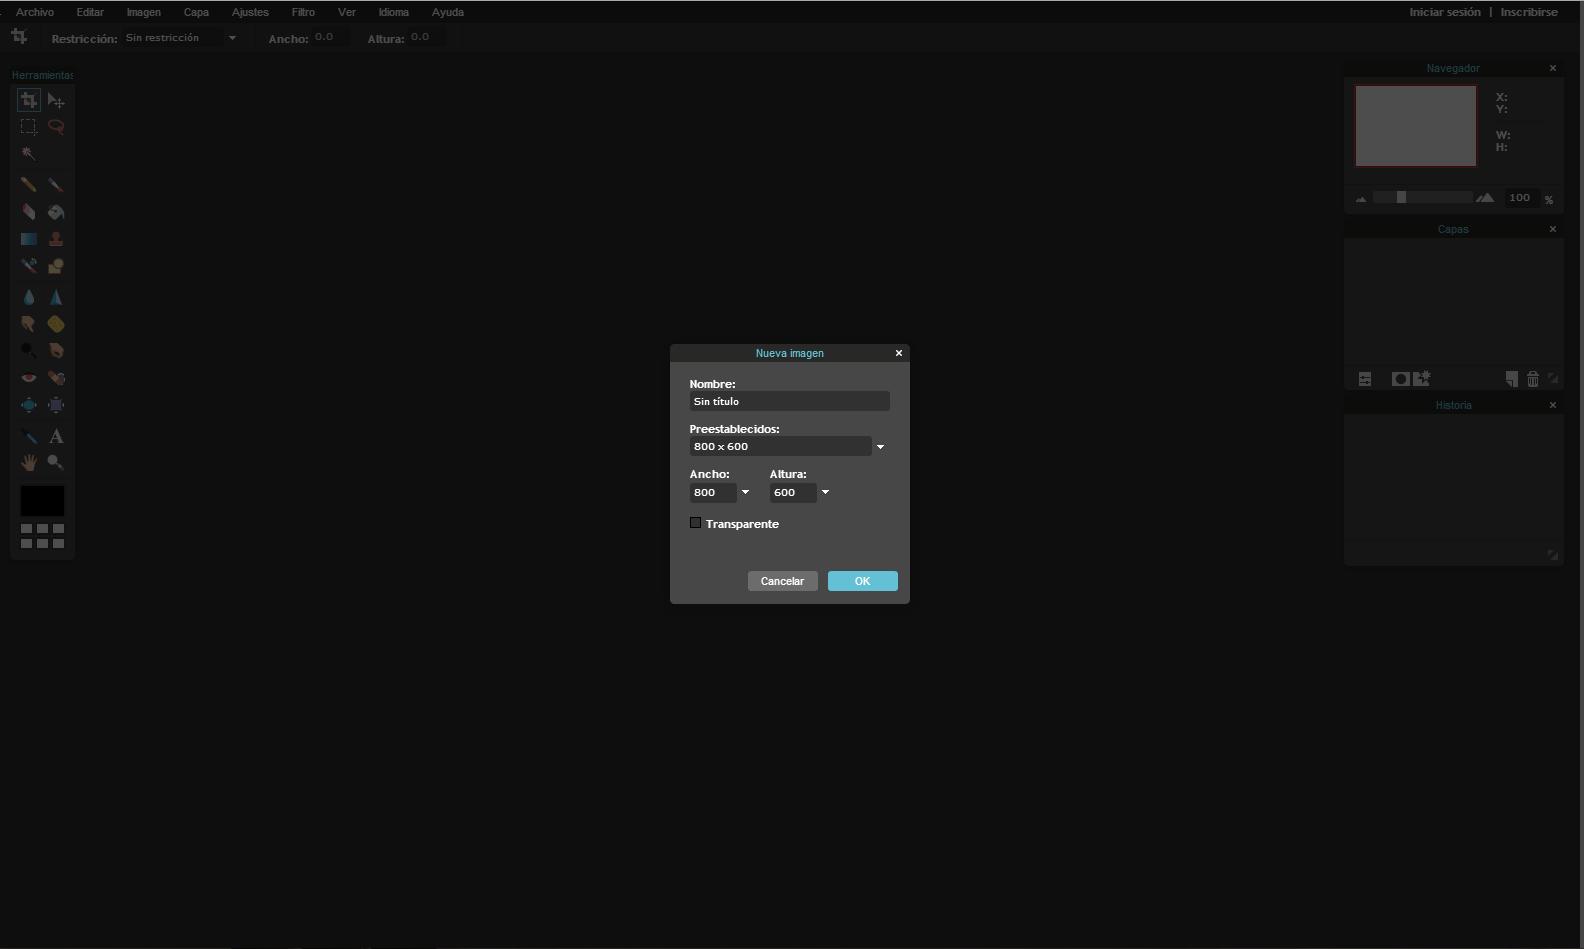 Tutorial de Pixlr: Como usar Pixlr Editor